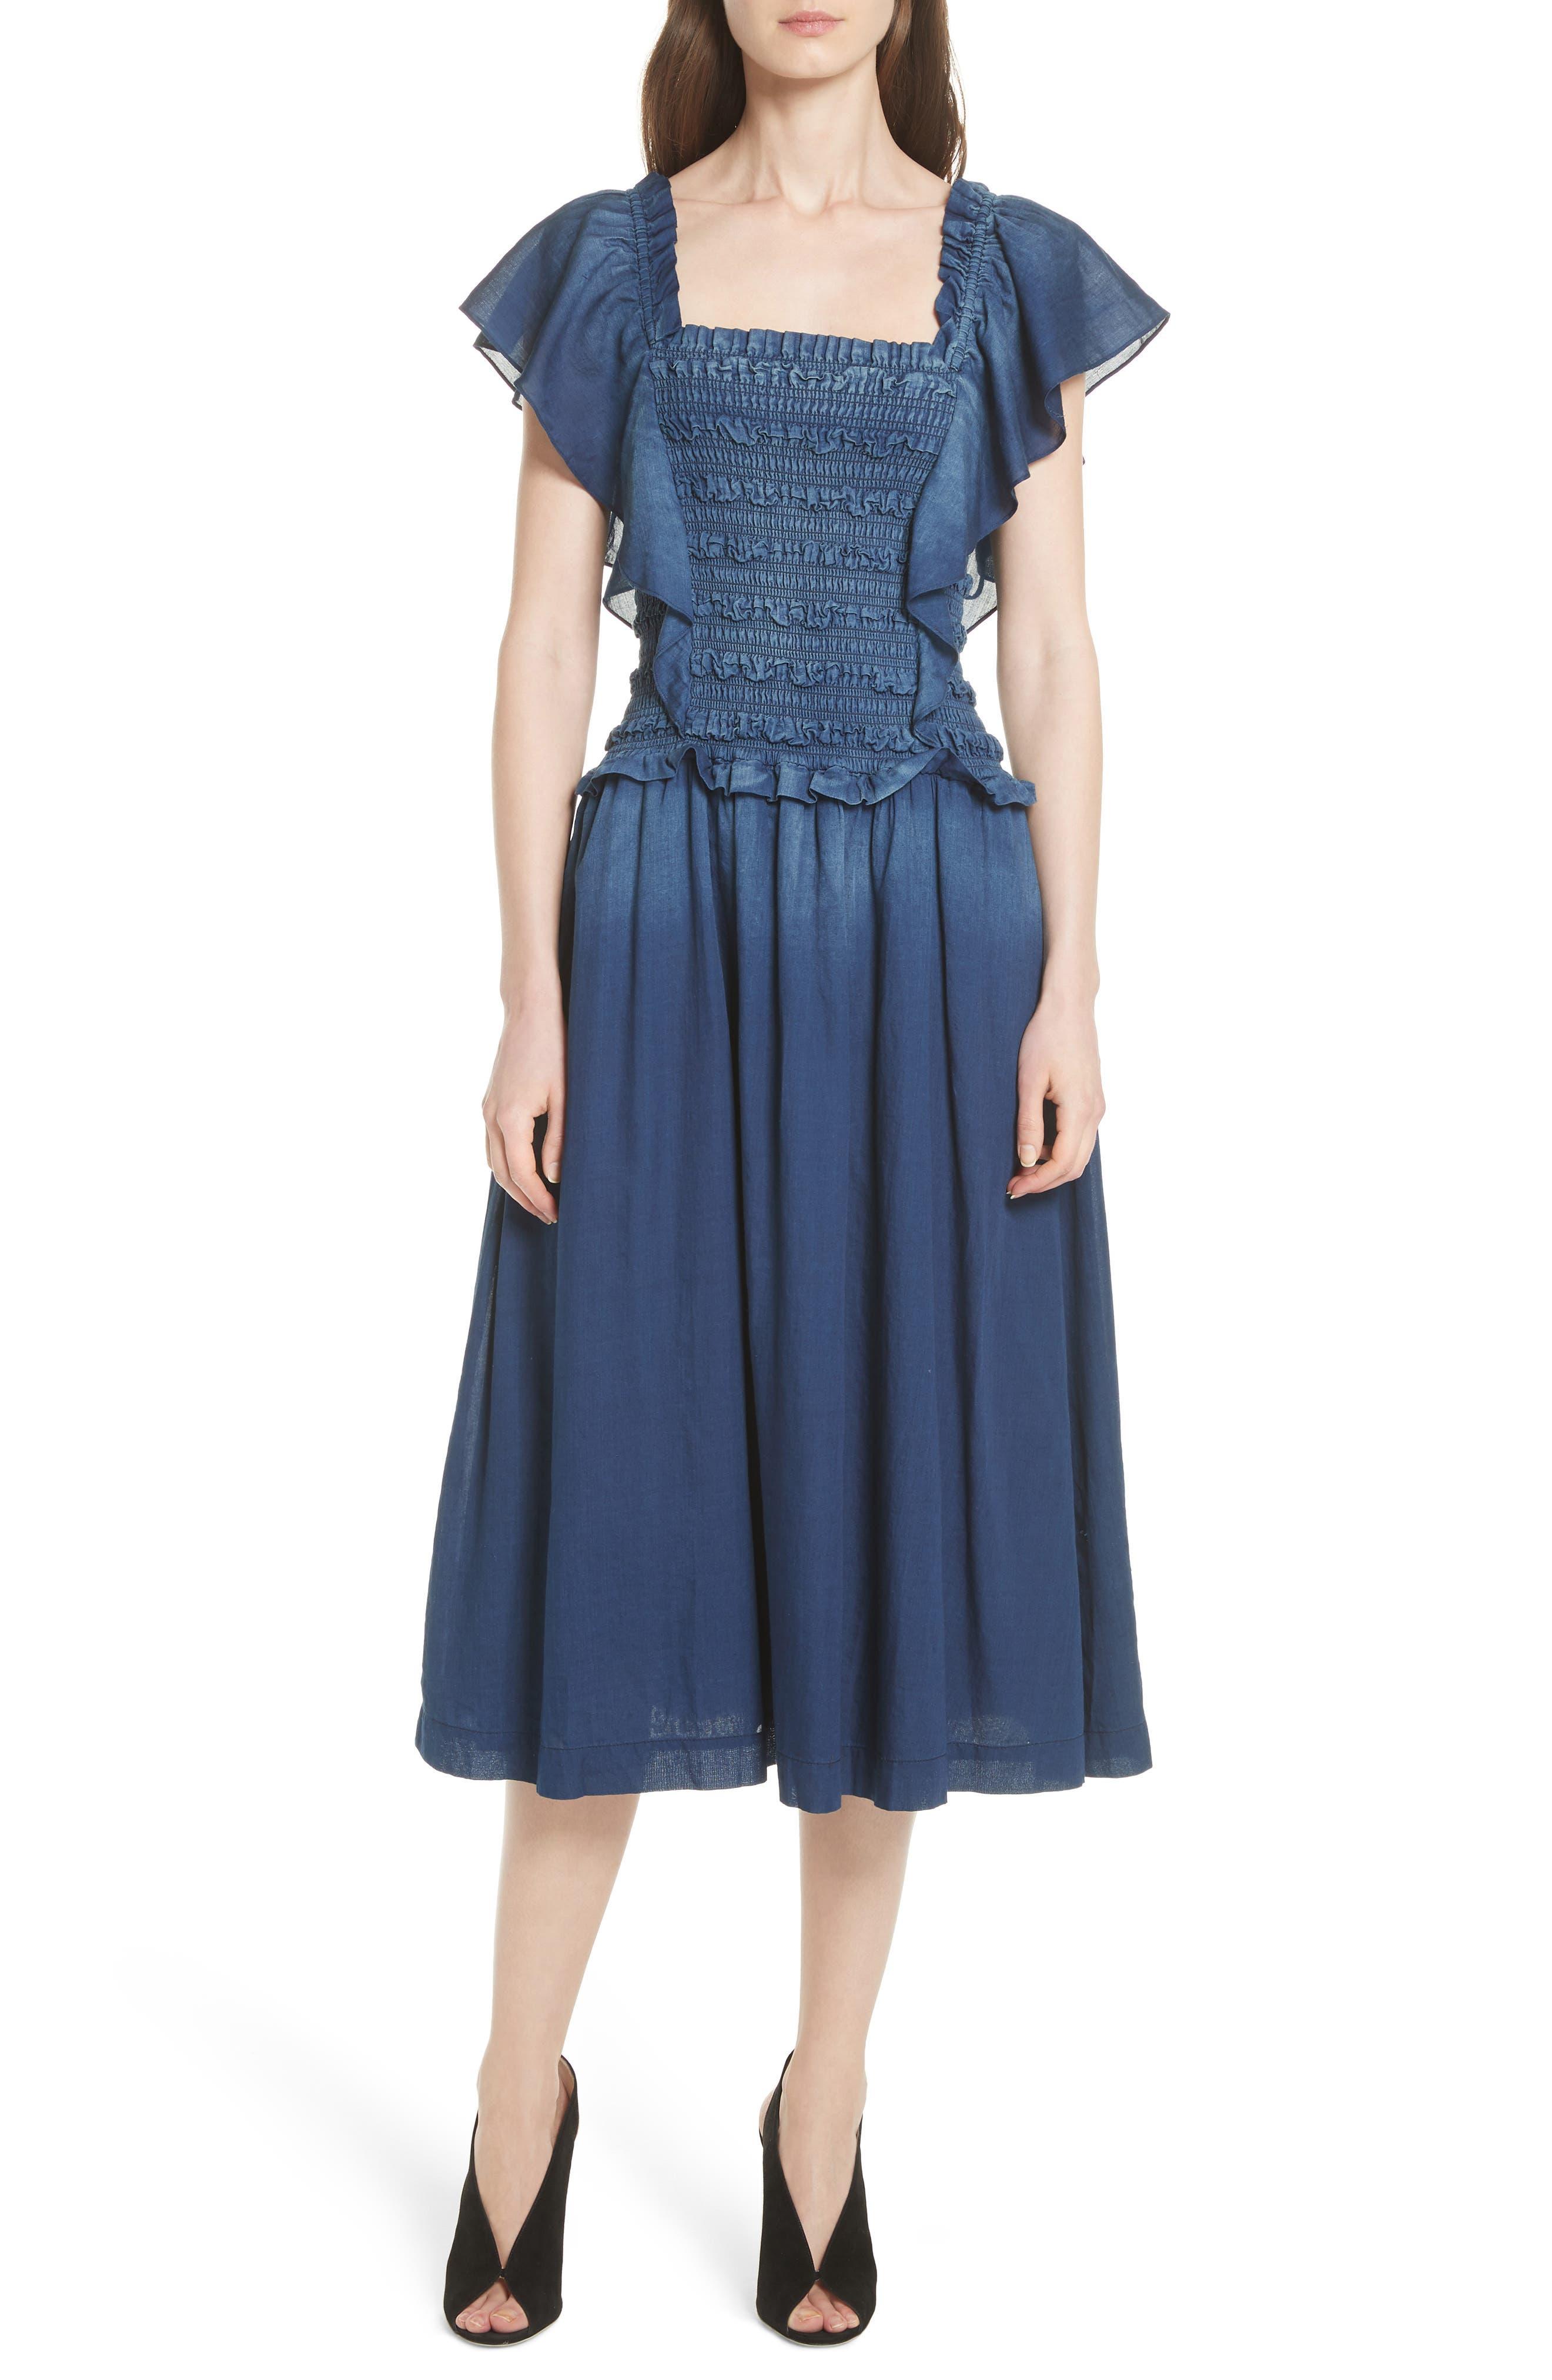 La Vie Rebecca Taylor Smocked Tissue Denim Dress